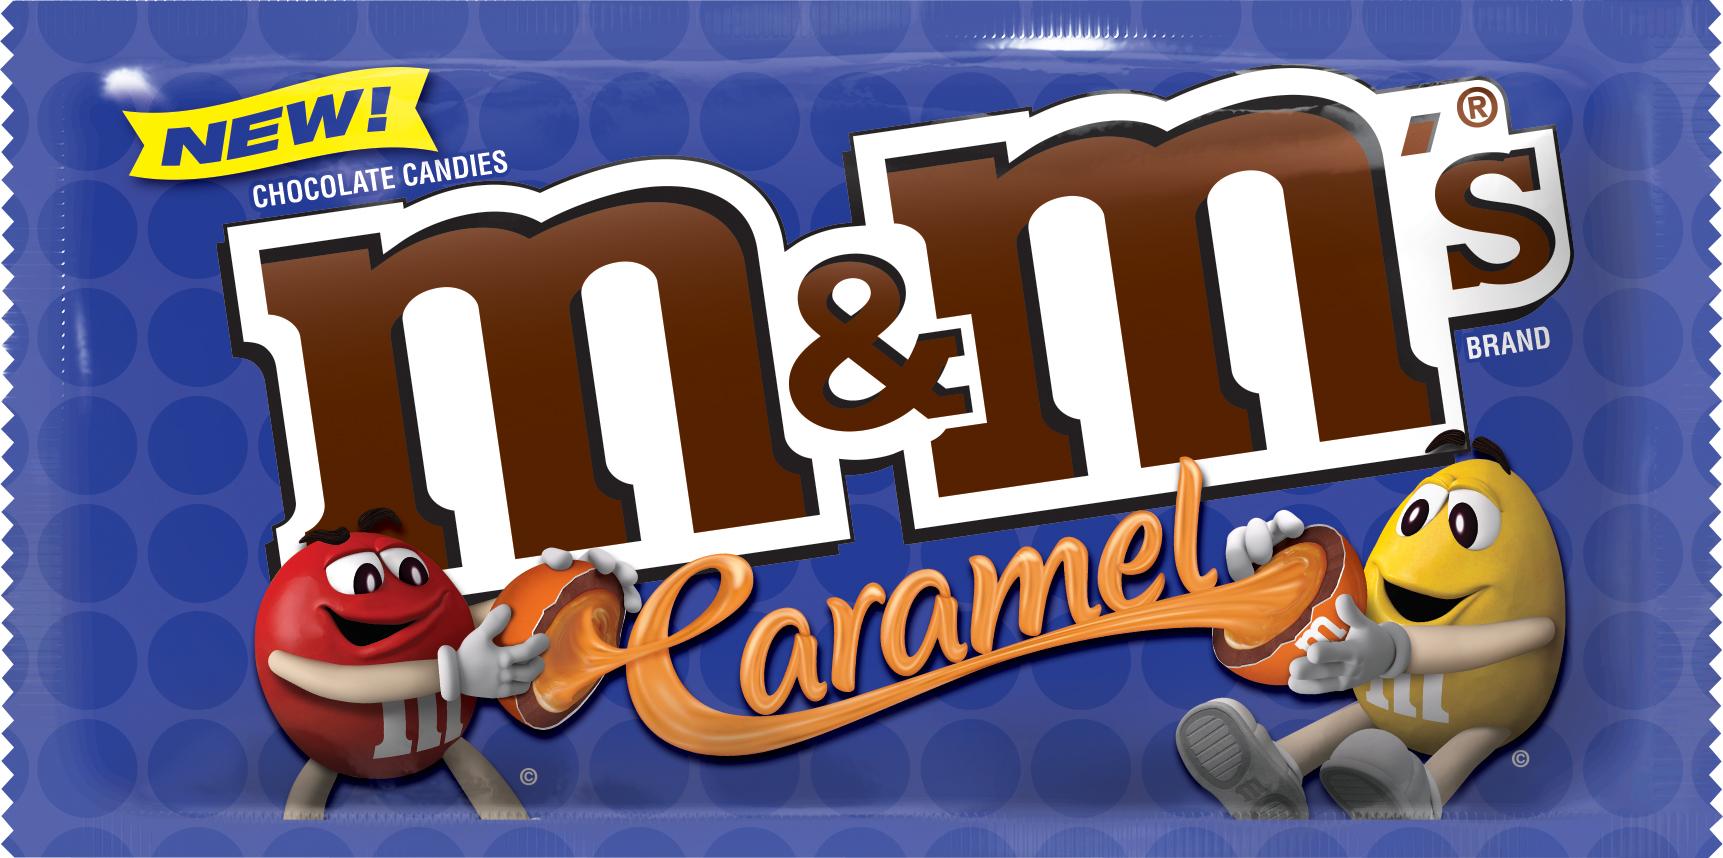 M&Ms new caramel flavor